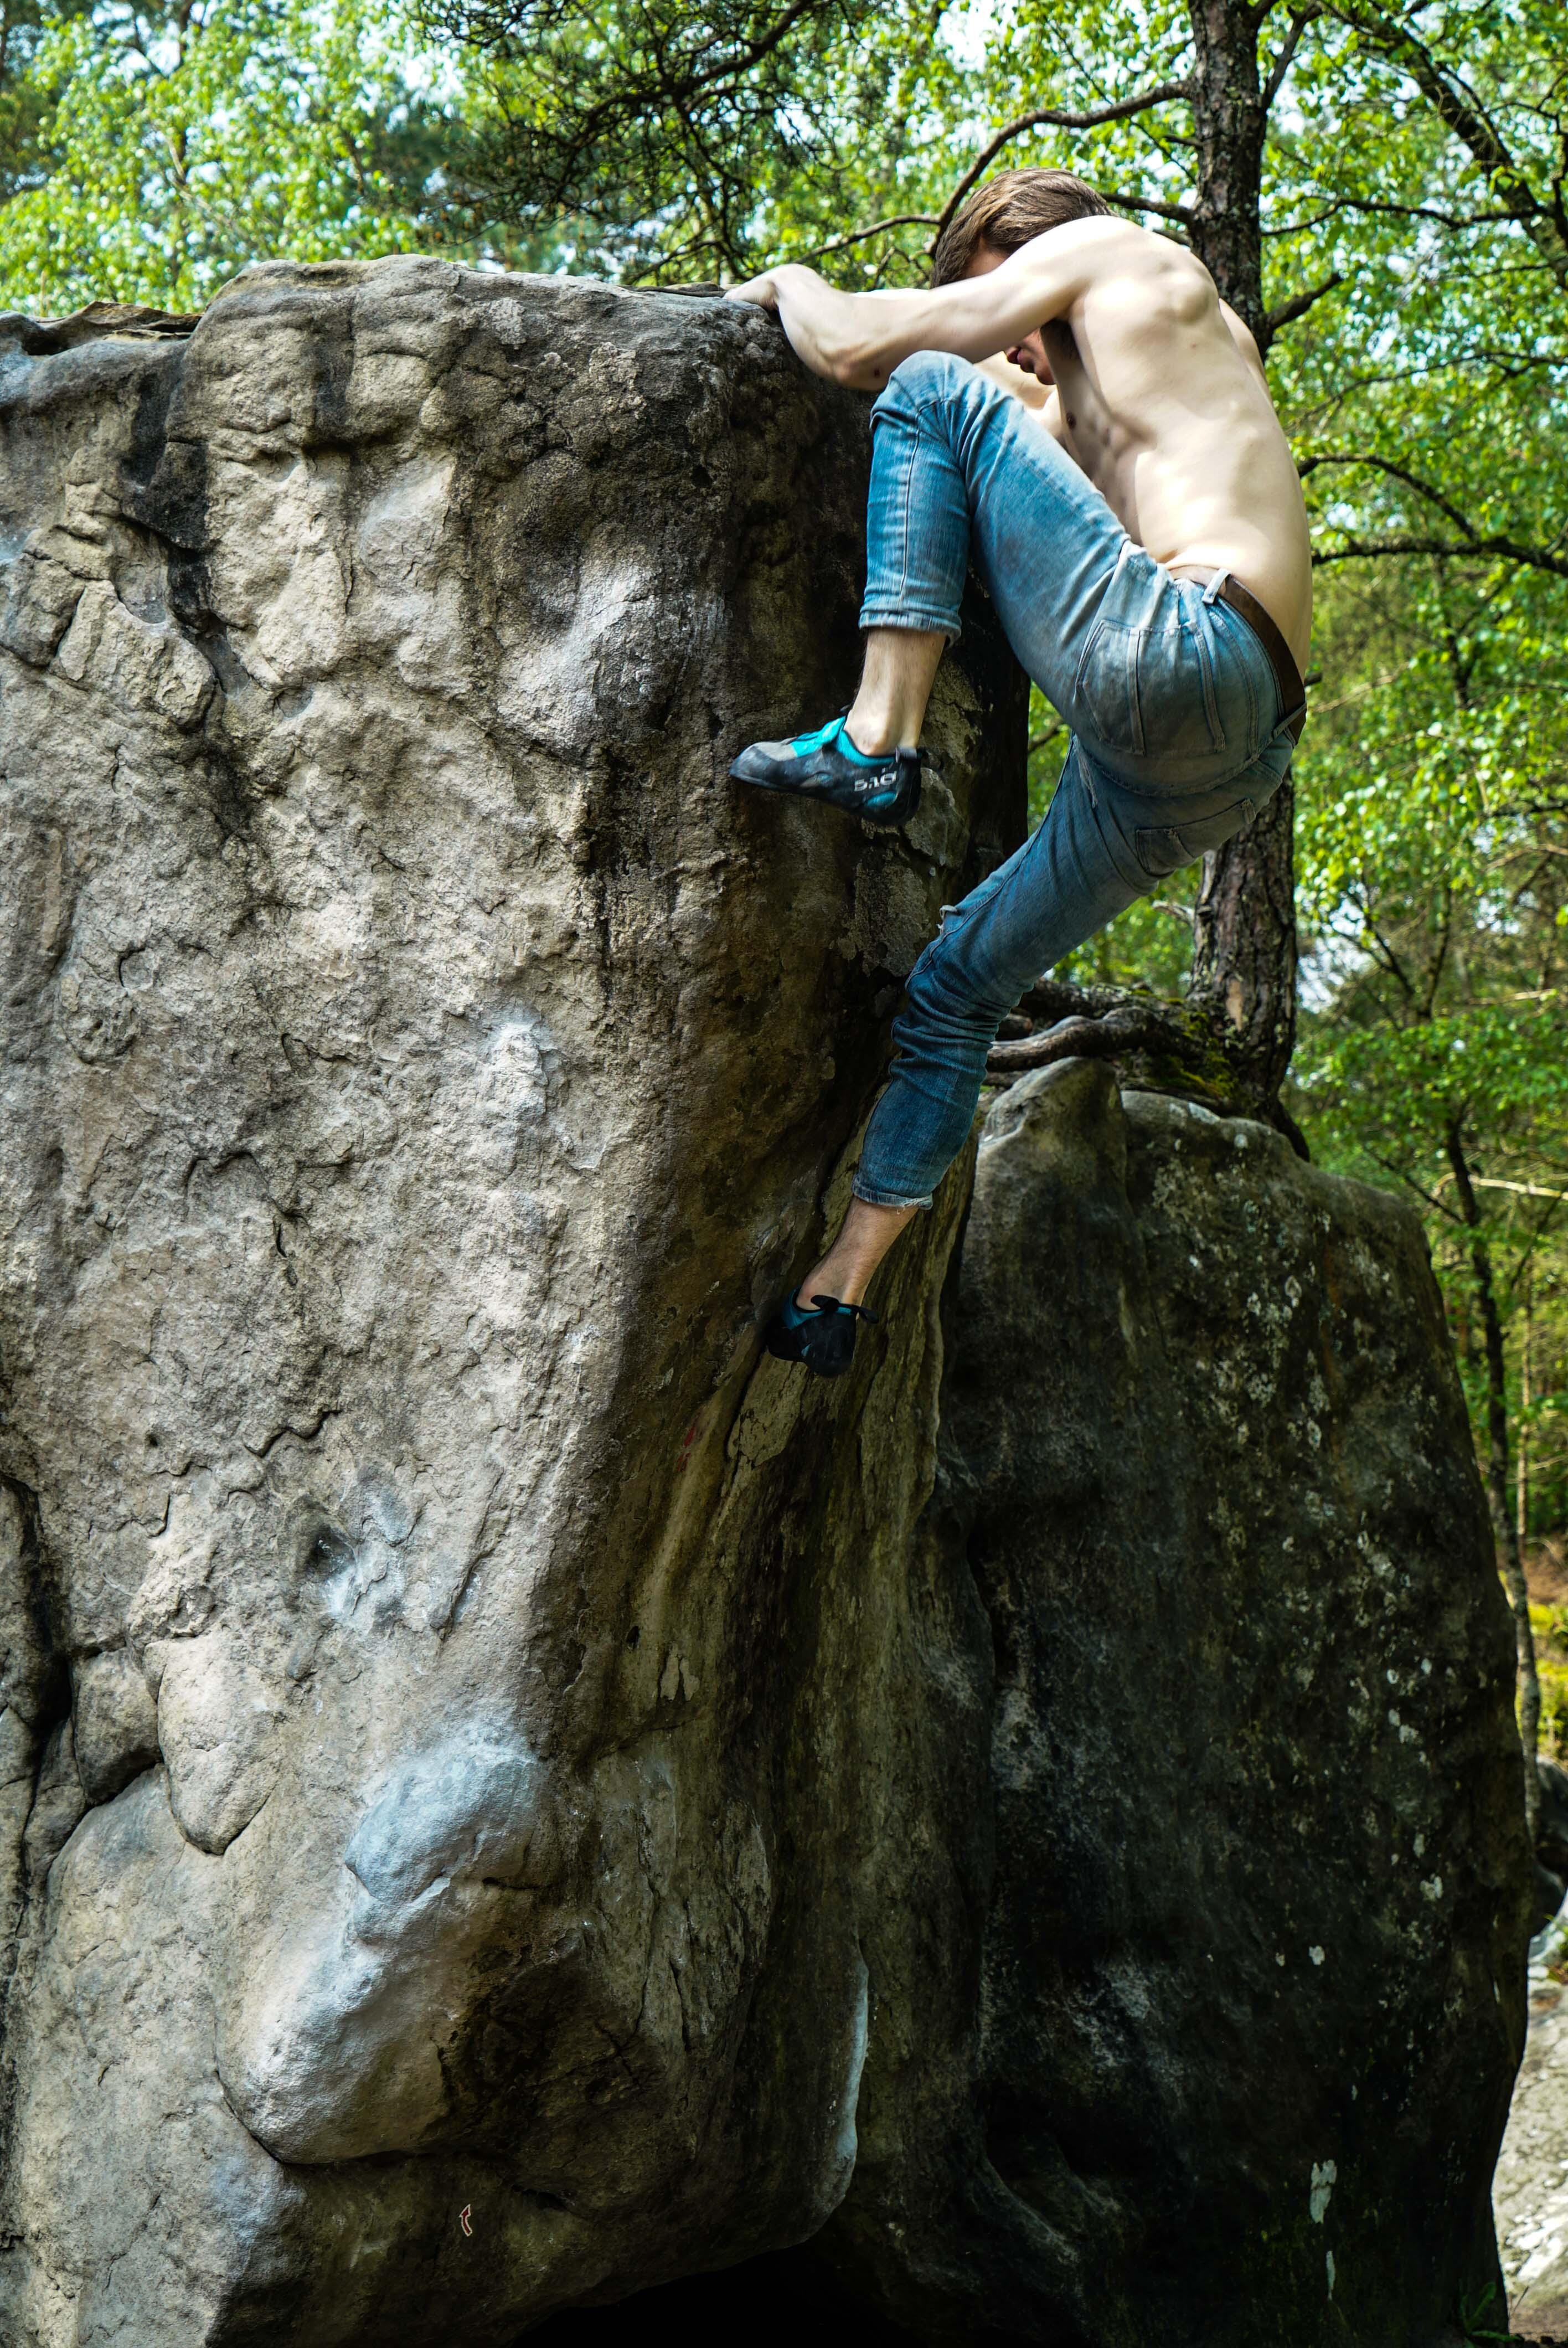 fontainbleau climbing 2016 mike brindley-72